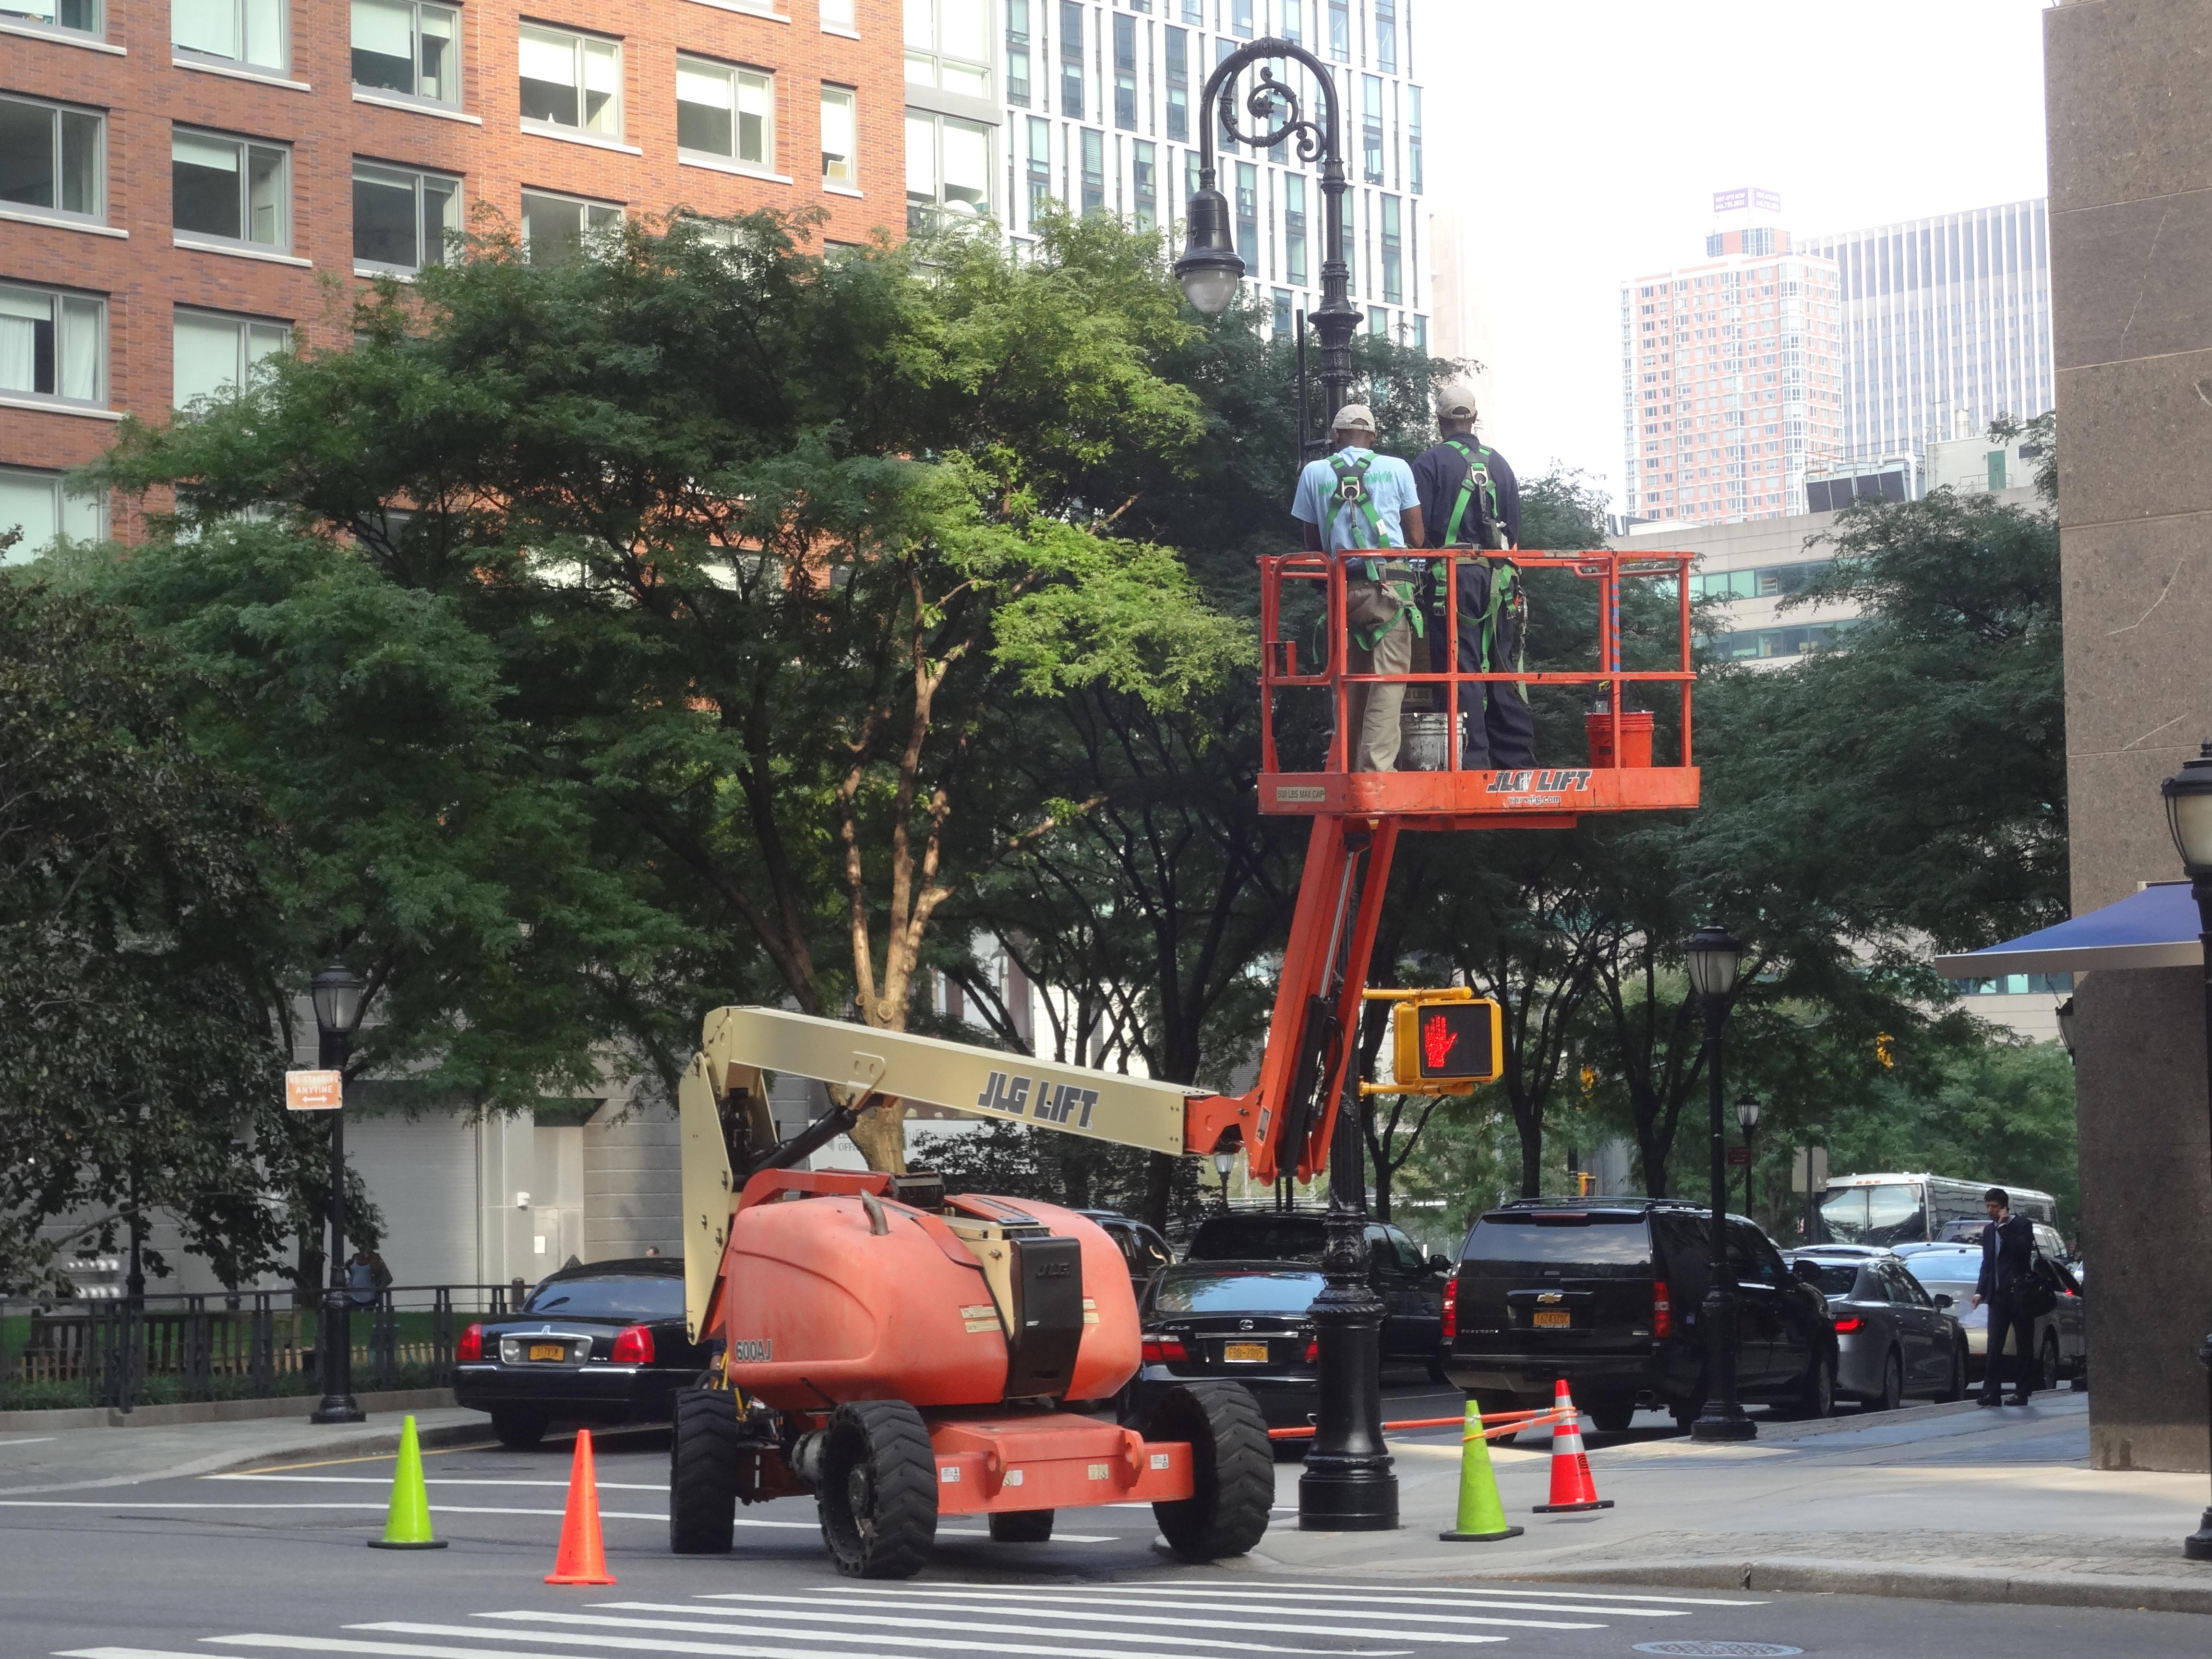 Painting a new street light pole